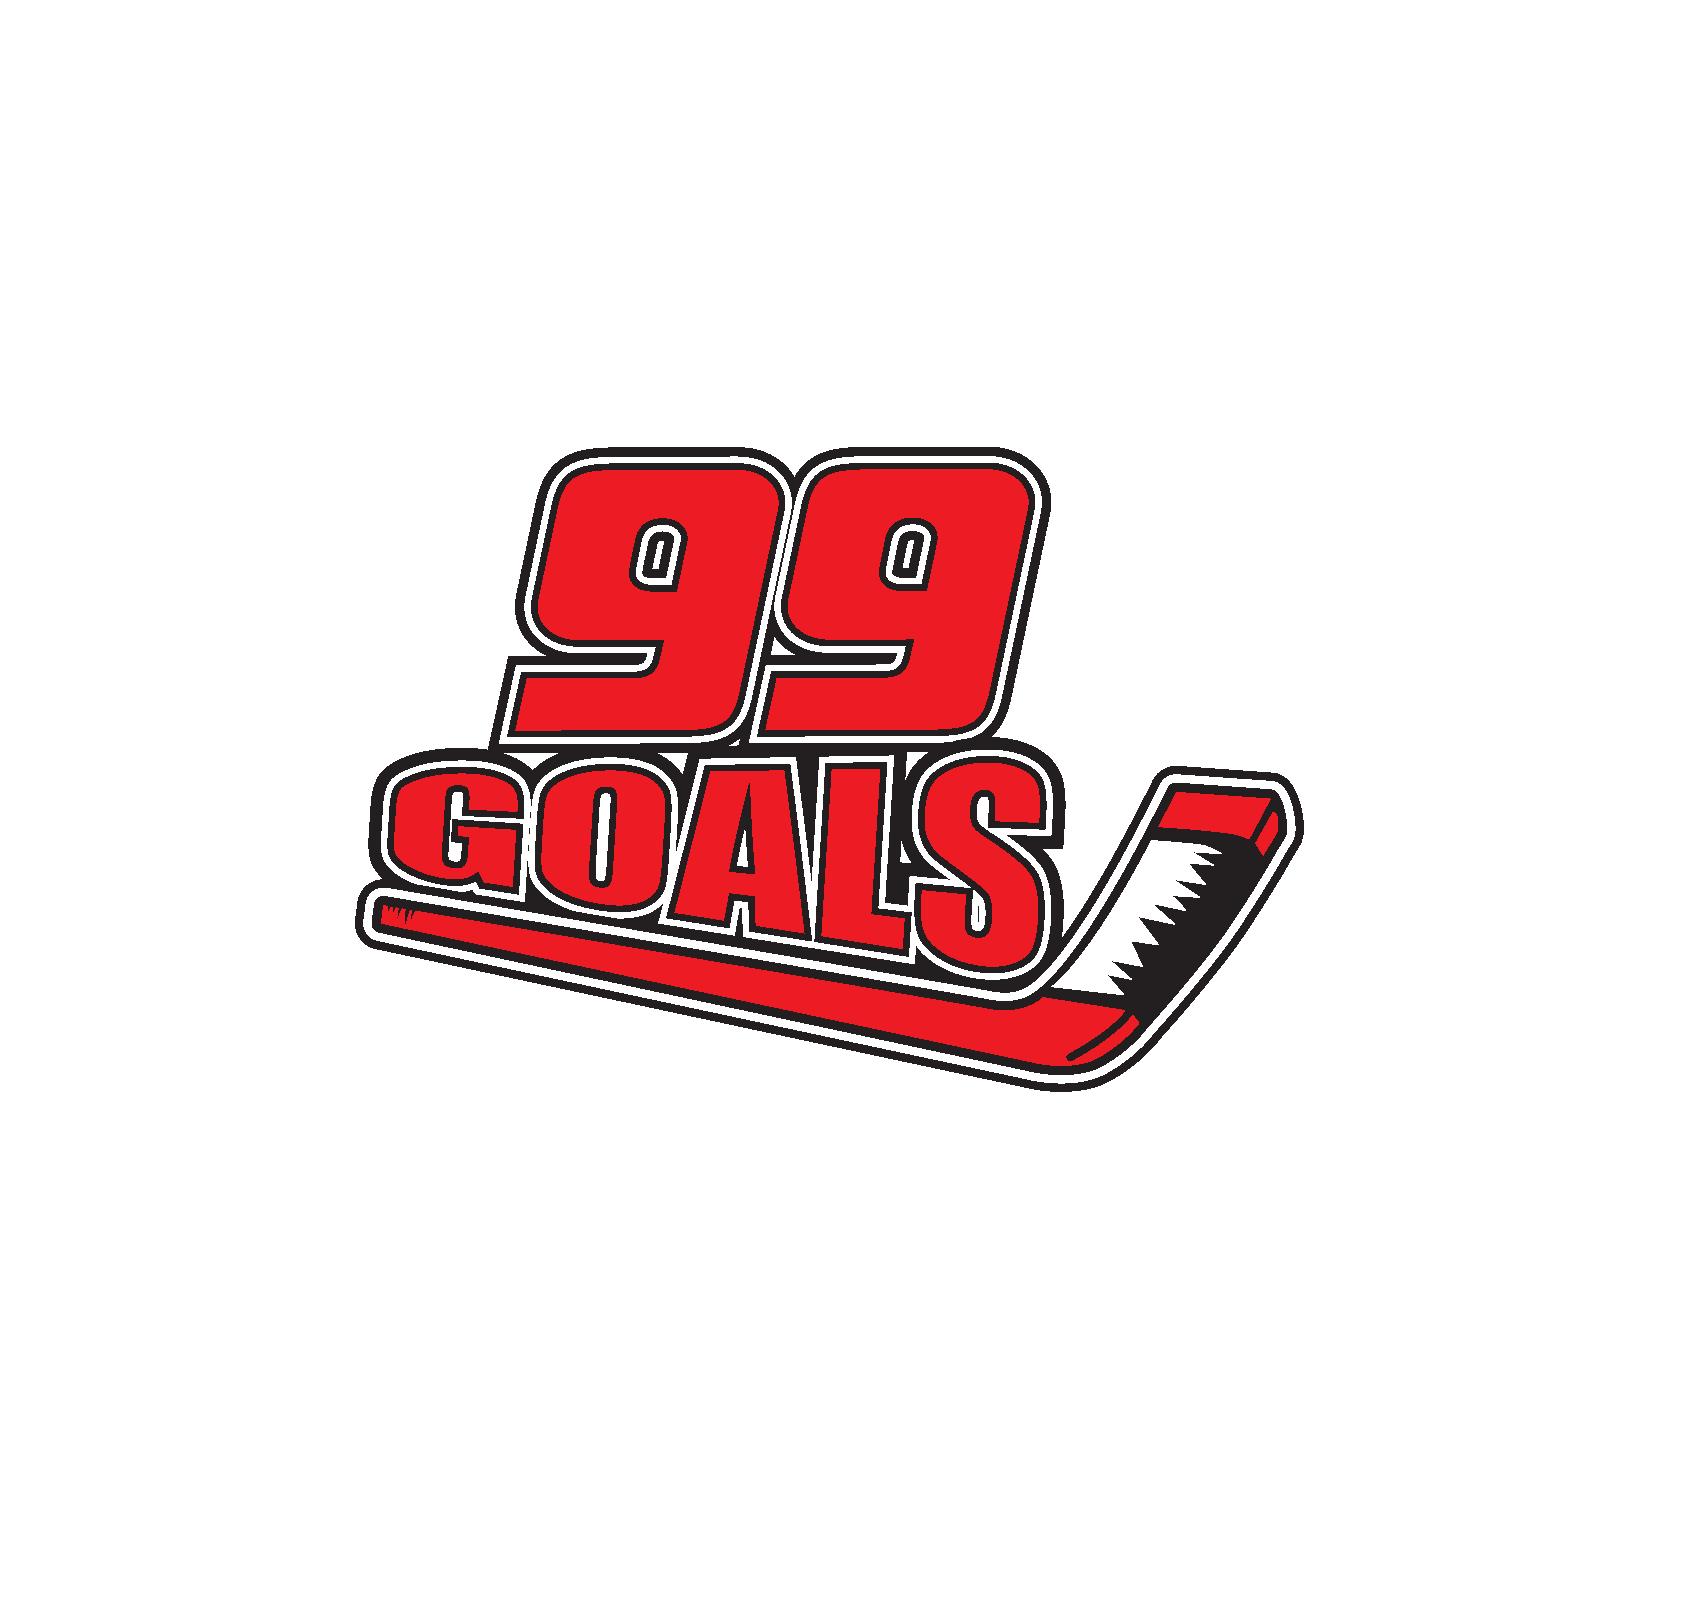 99goals